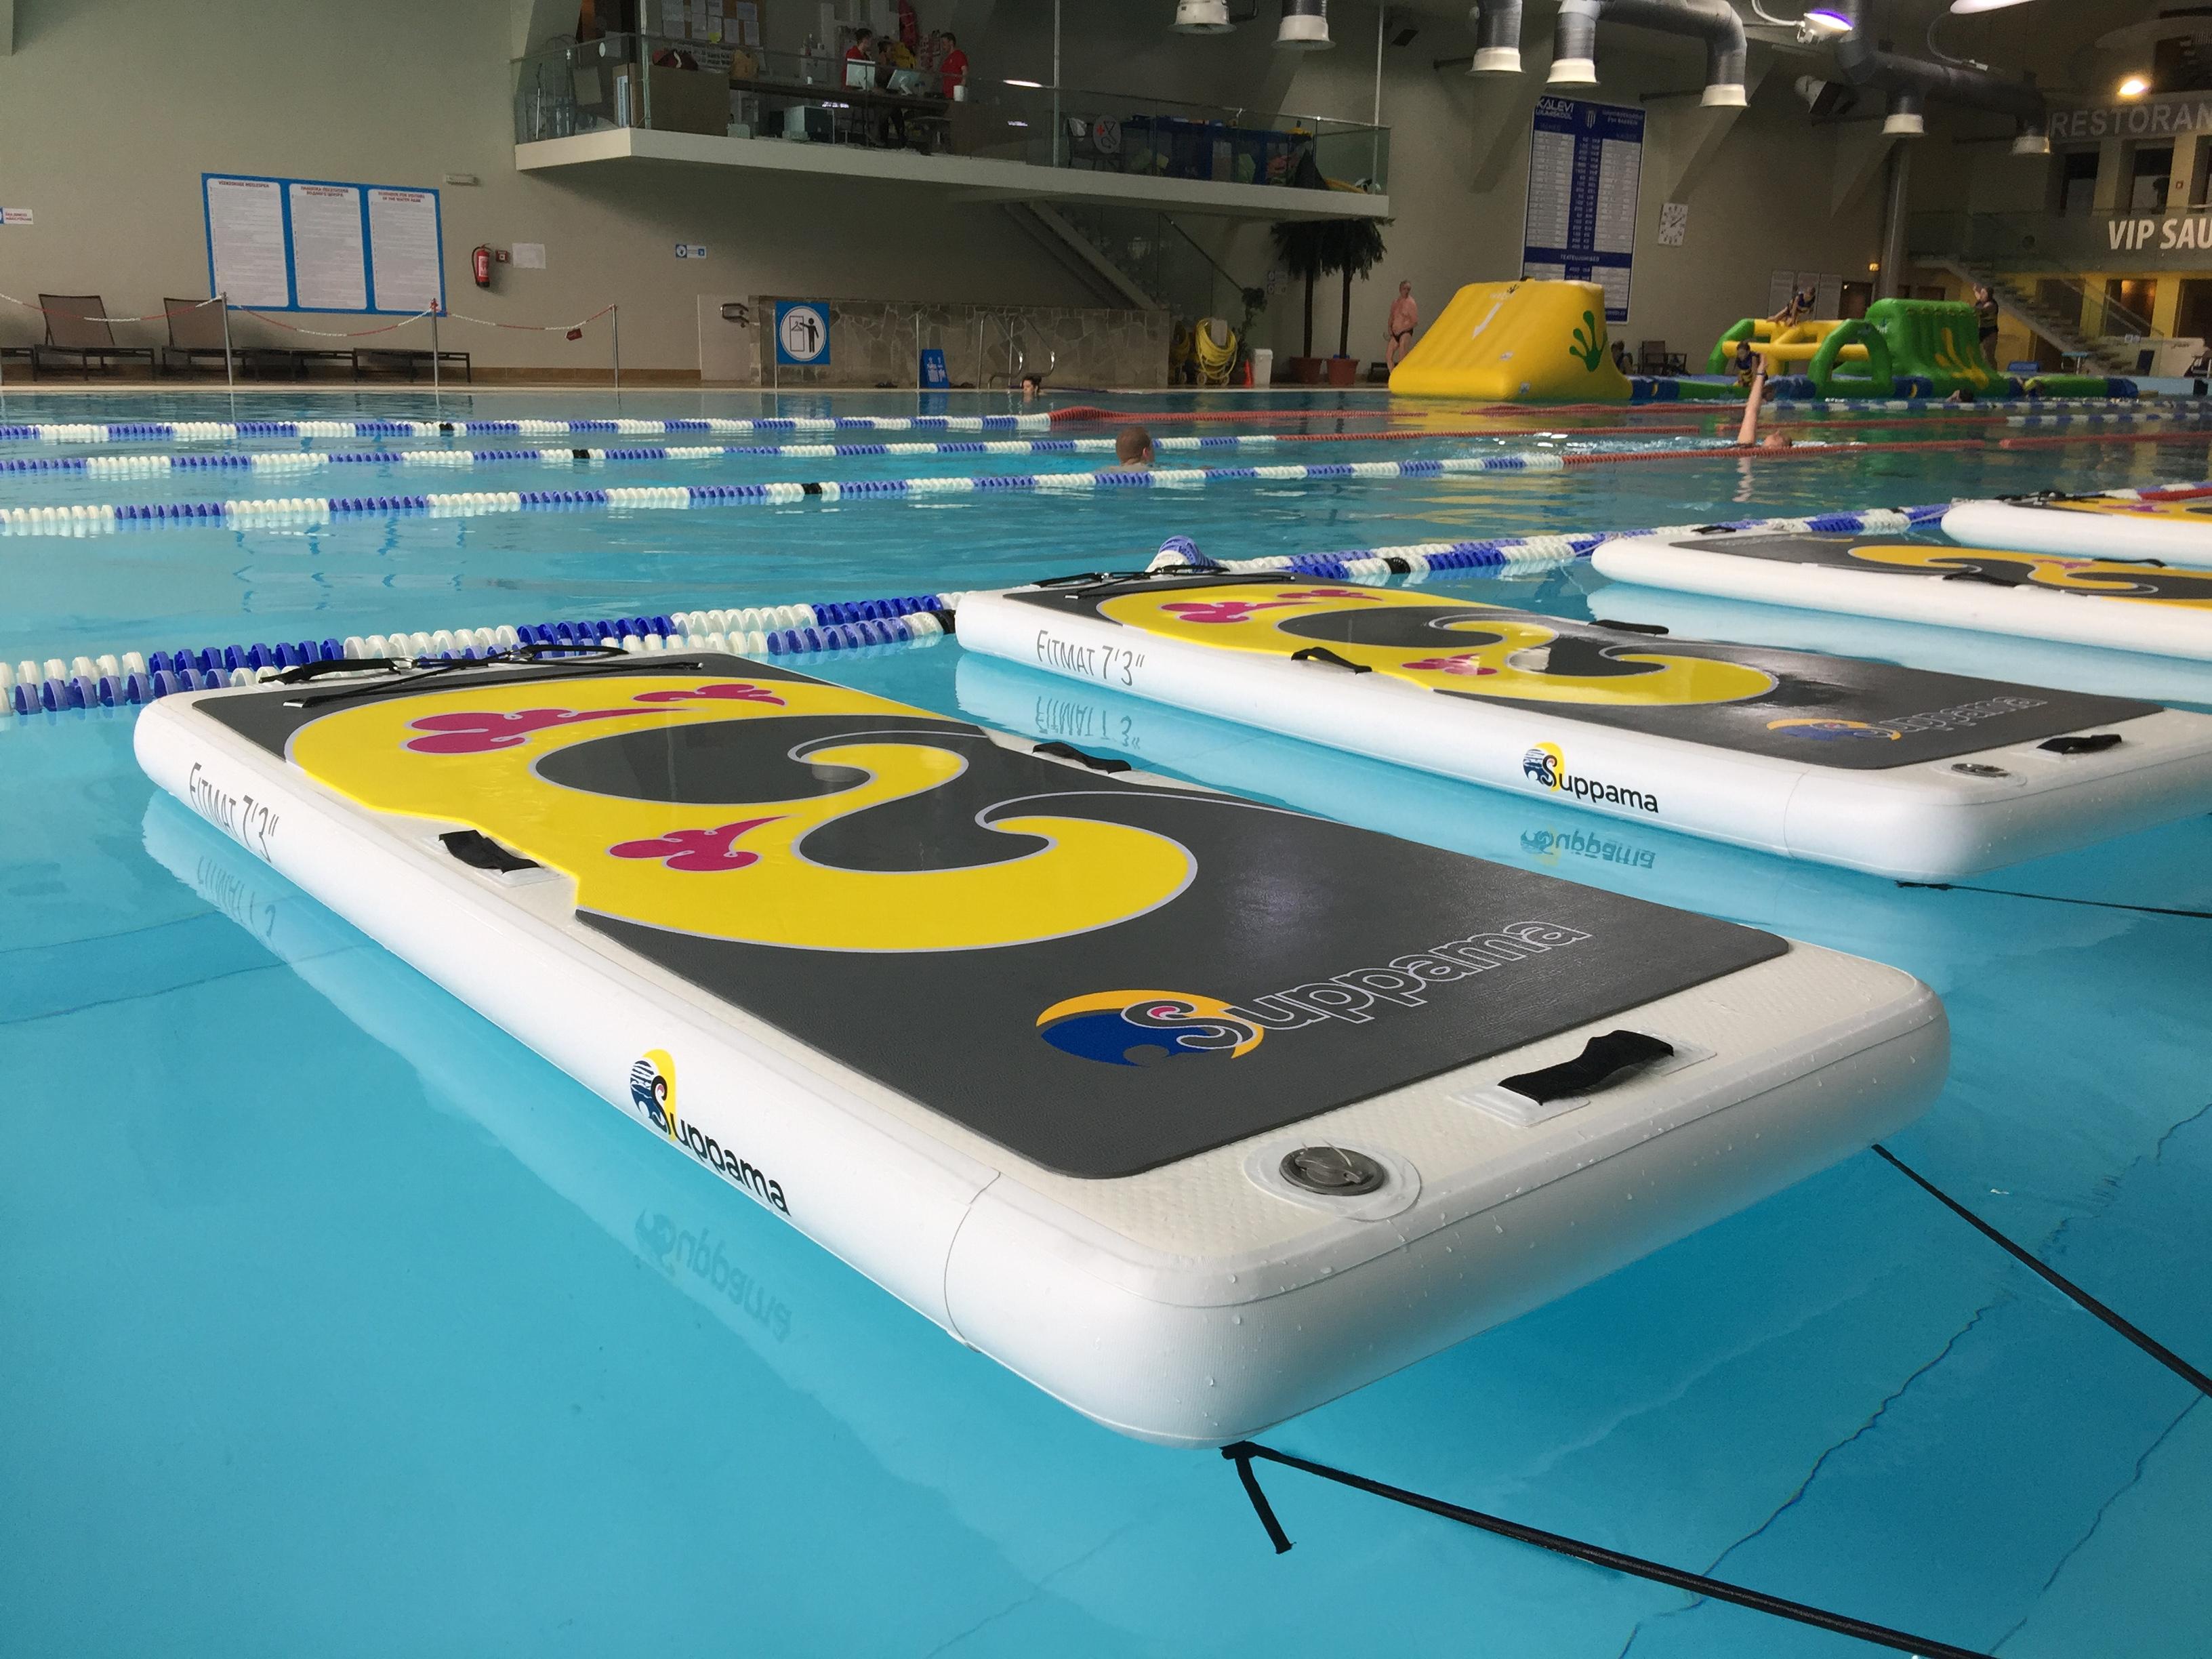 Suppama Fitmat – Floating Fitness Training Platform